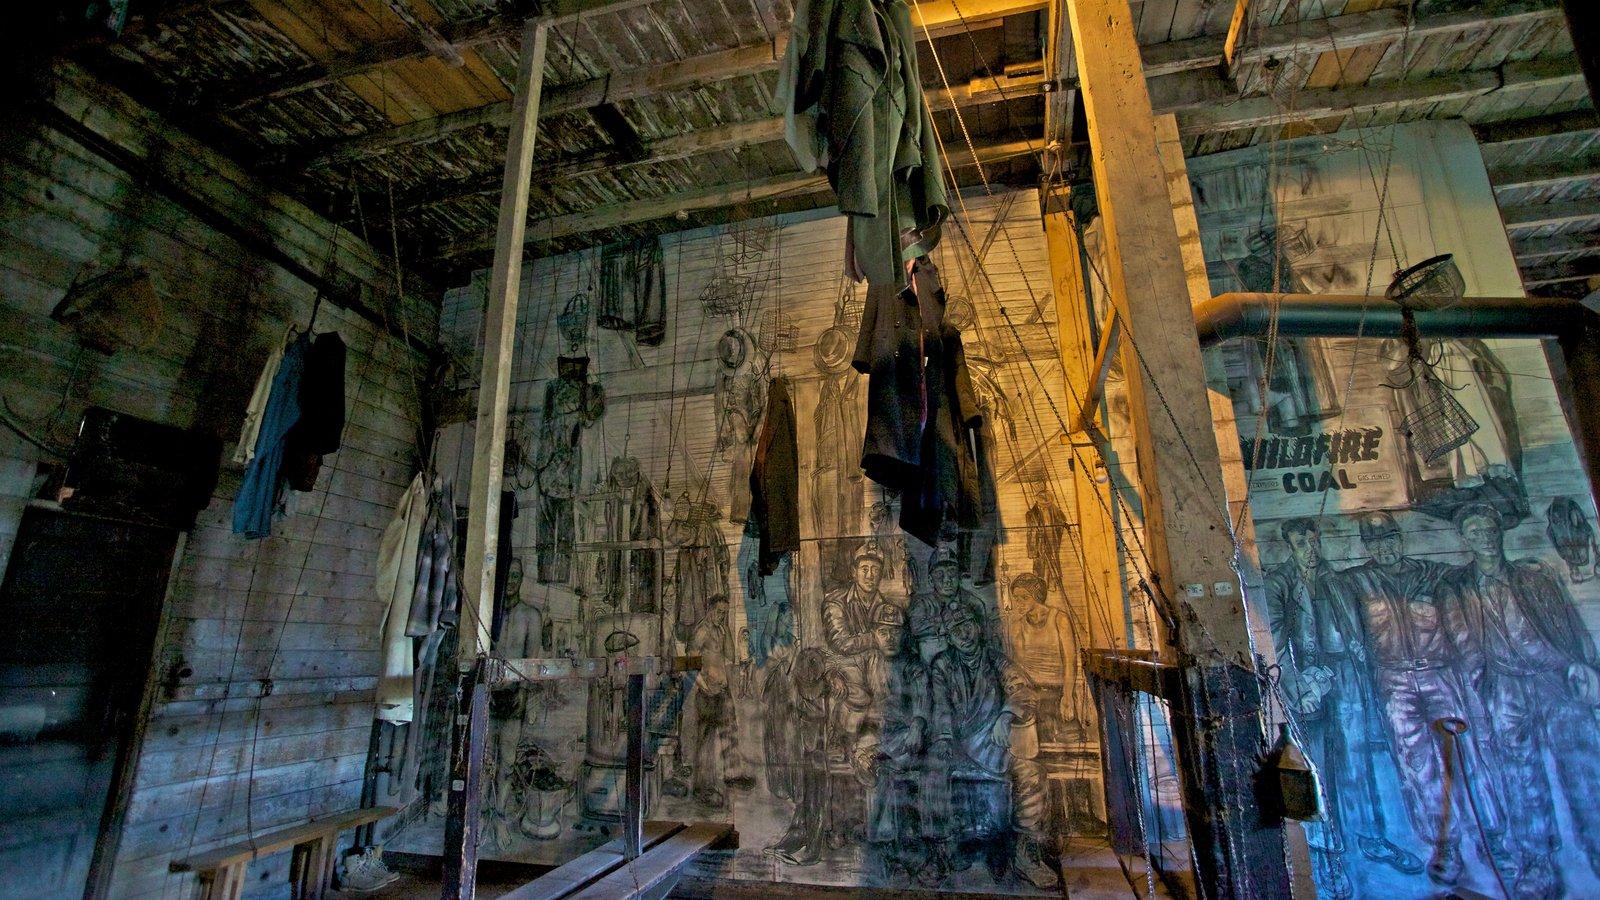 Atlas Coal Mine National Historic Site showing interior views